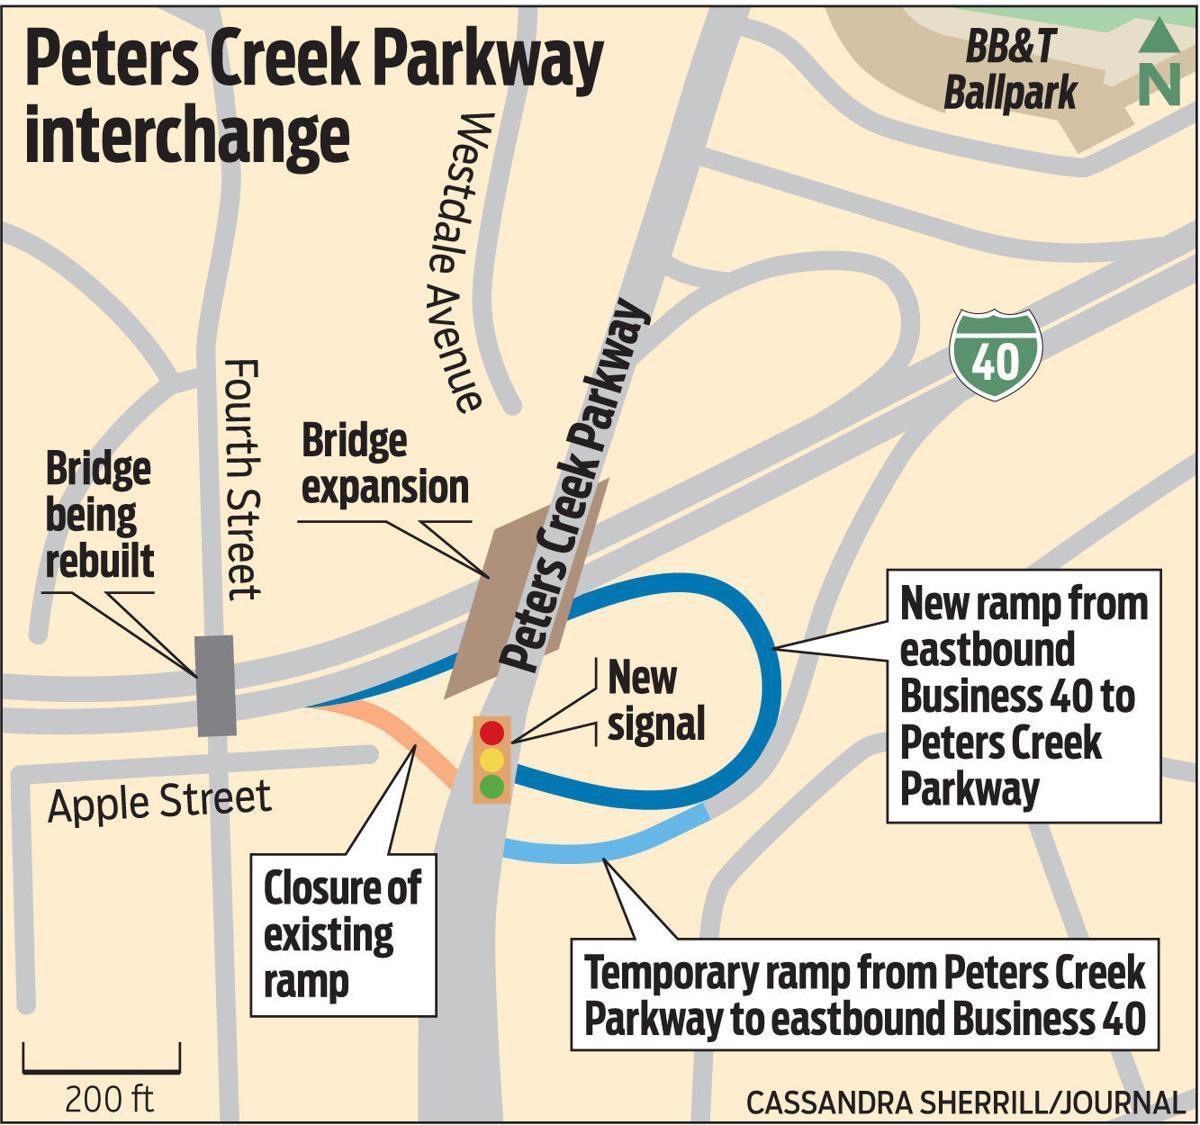 New Building On Peters Creek Parkway